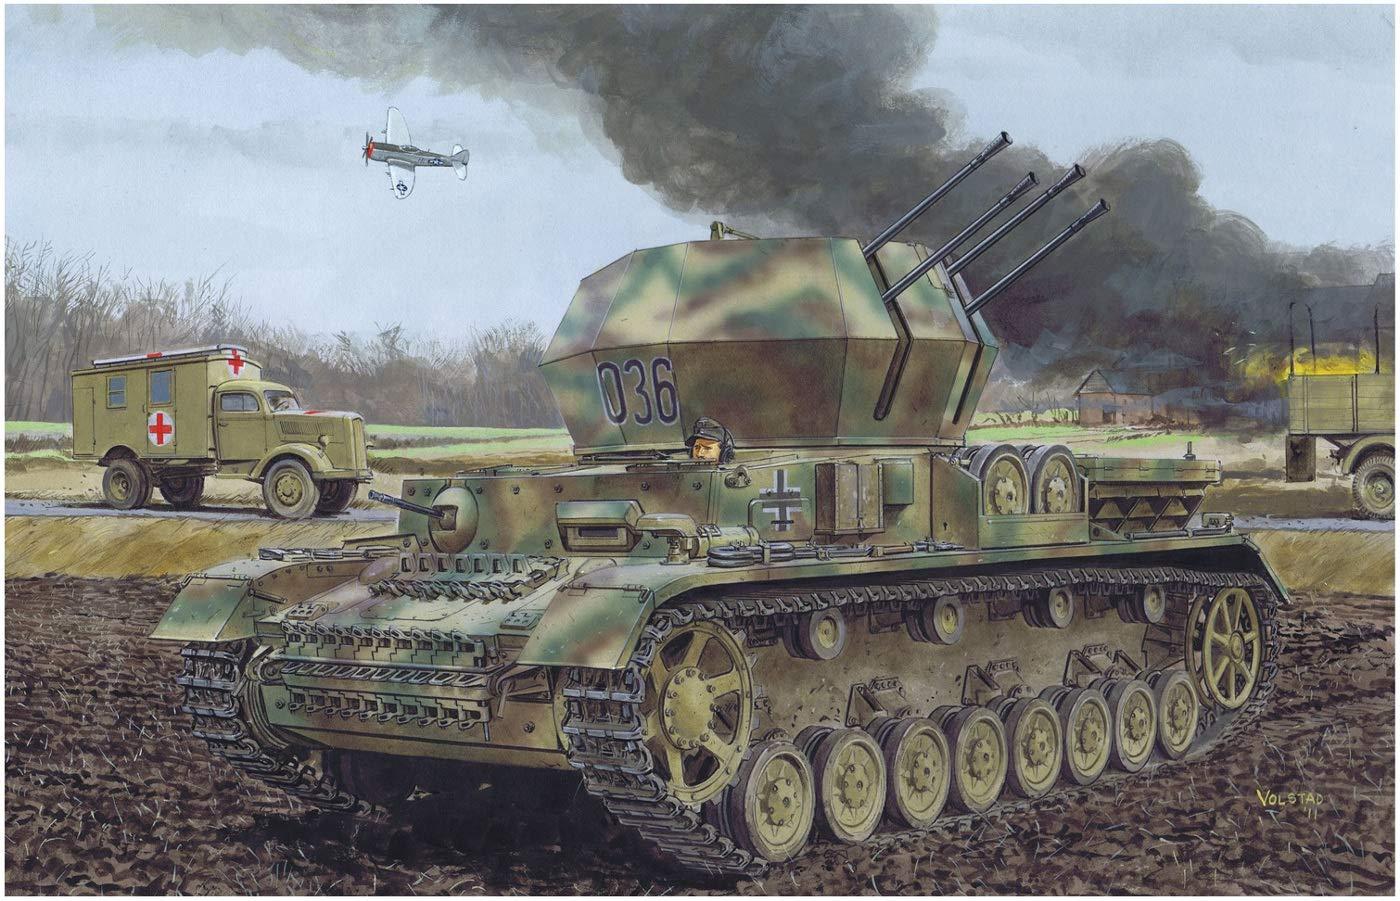 1/35『WW.II ドイツ軍 IV号対空戦車 ヴィルベルヴィント初期生産型(2 in 1)』プラモデル-001